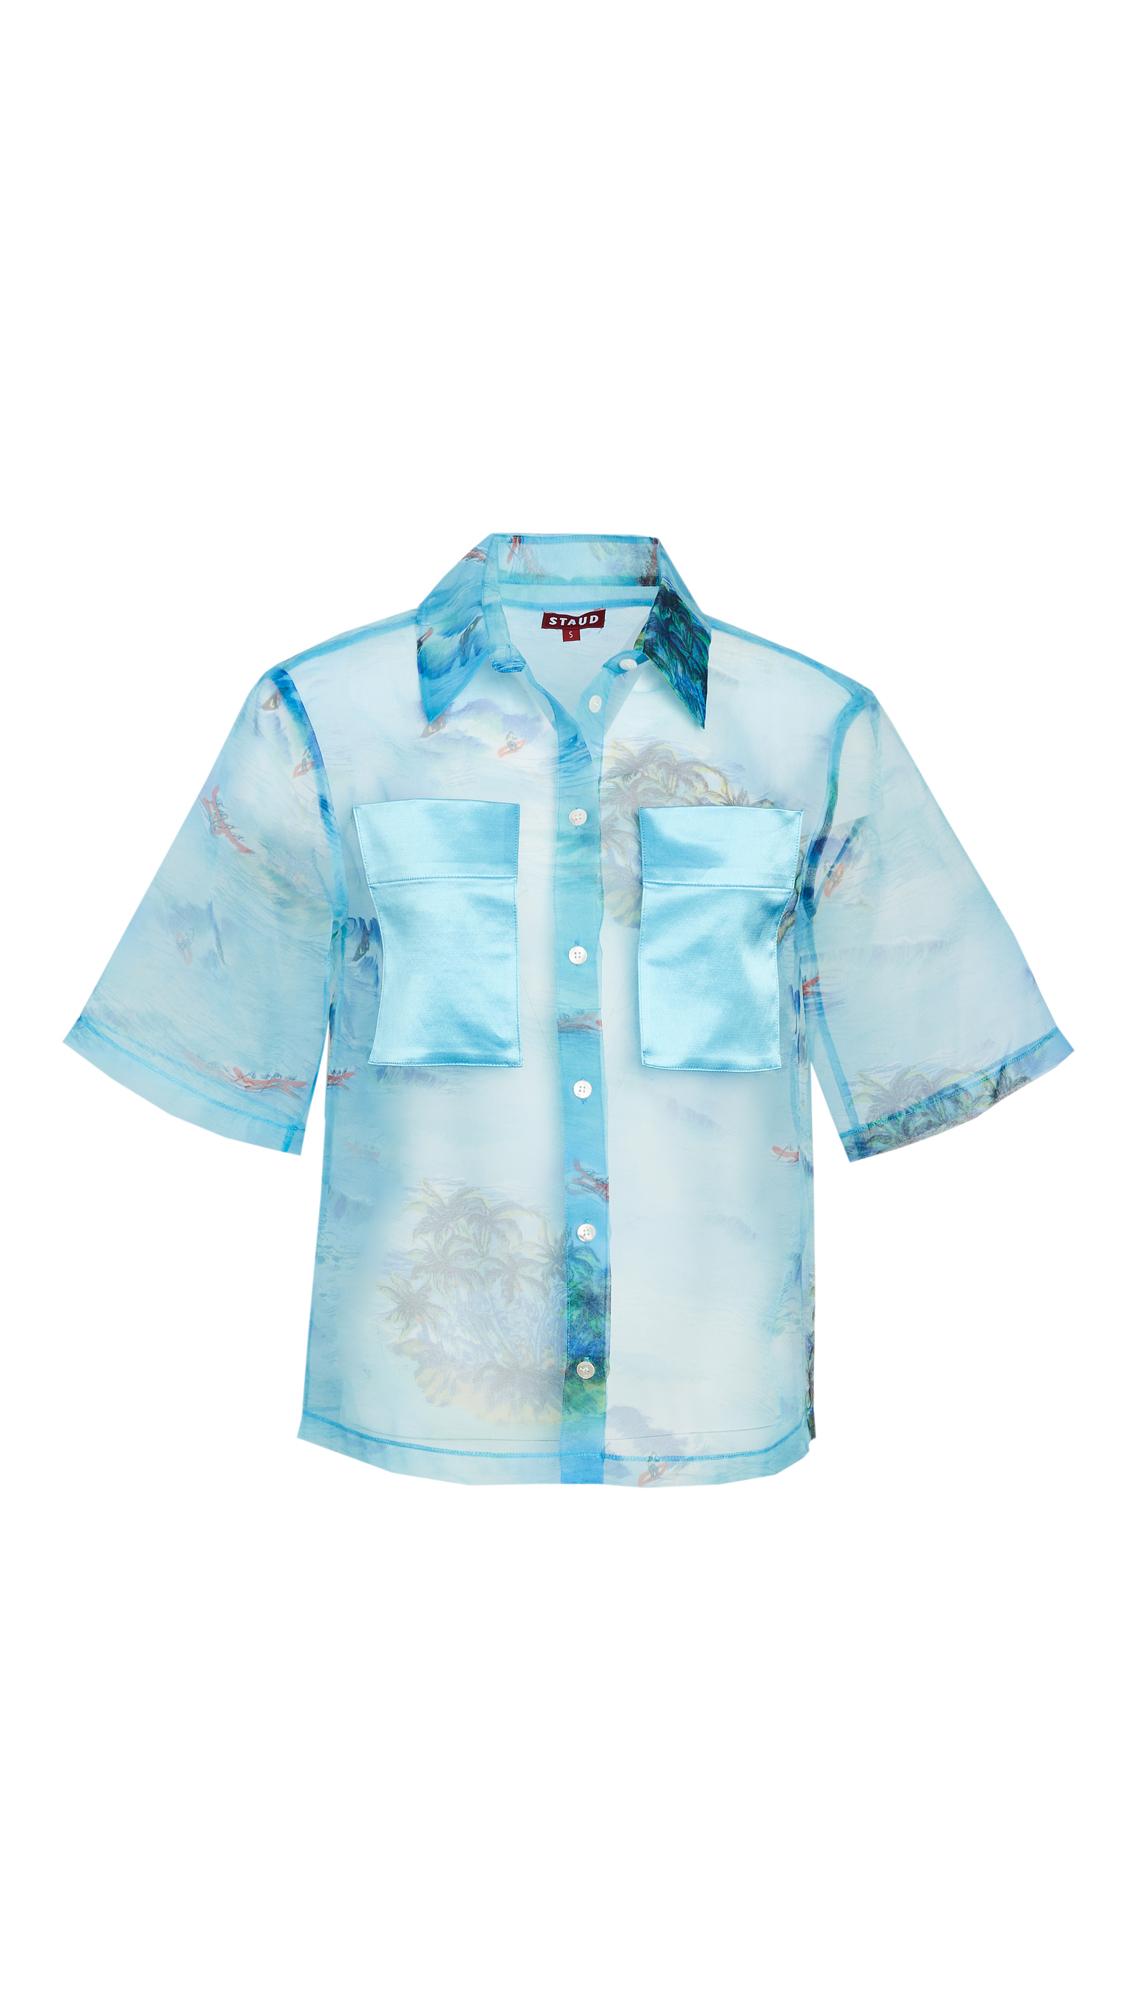 STAUD Cayman Shirt